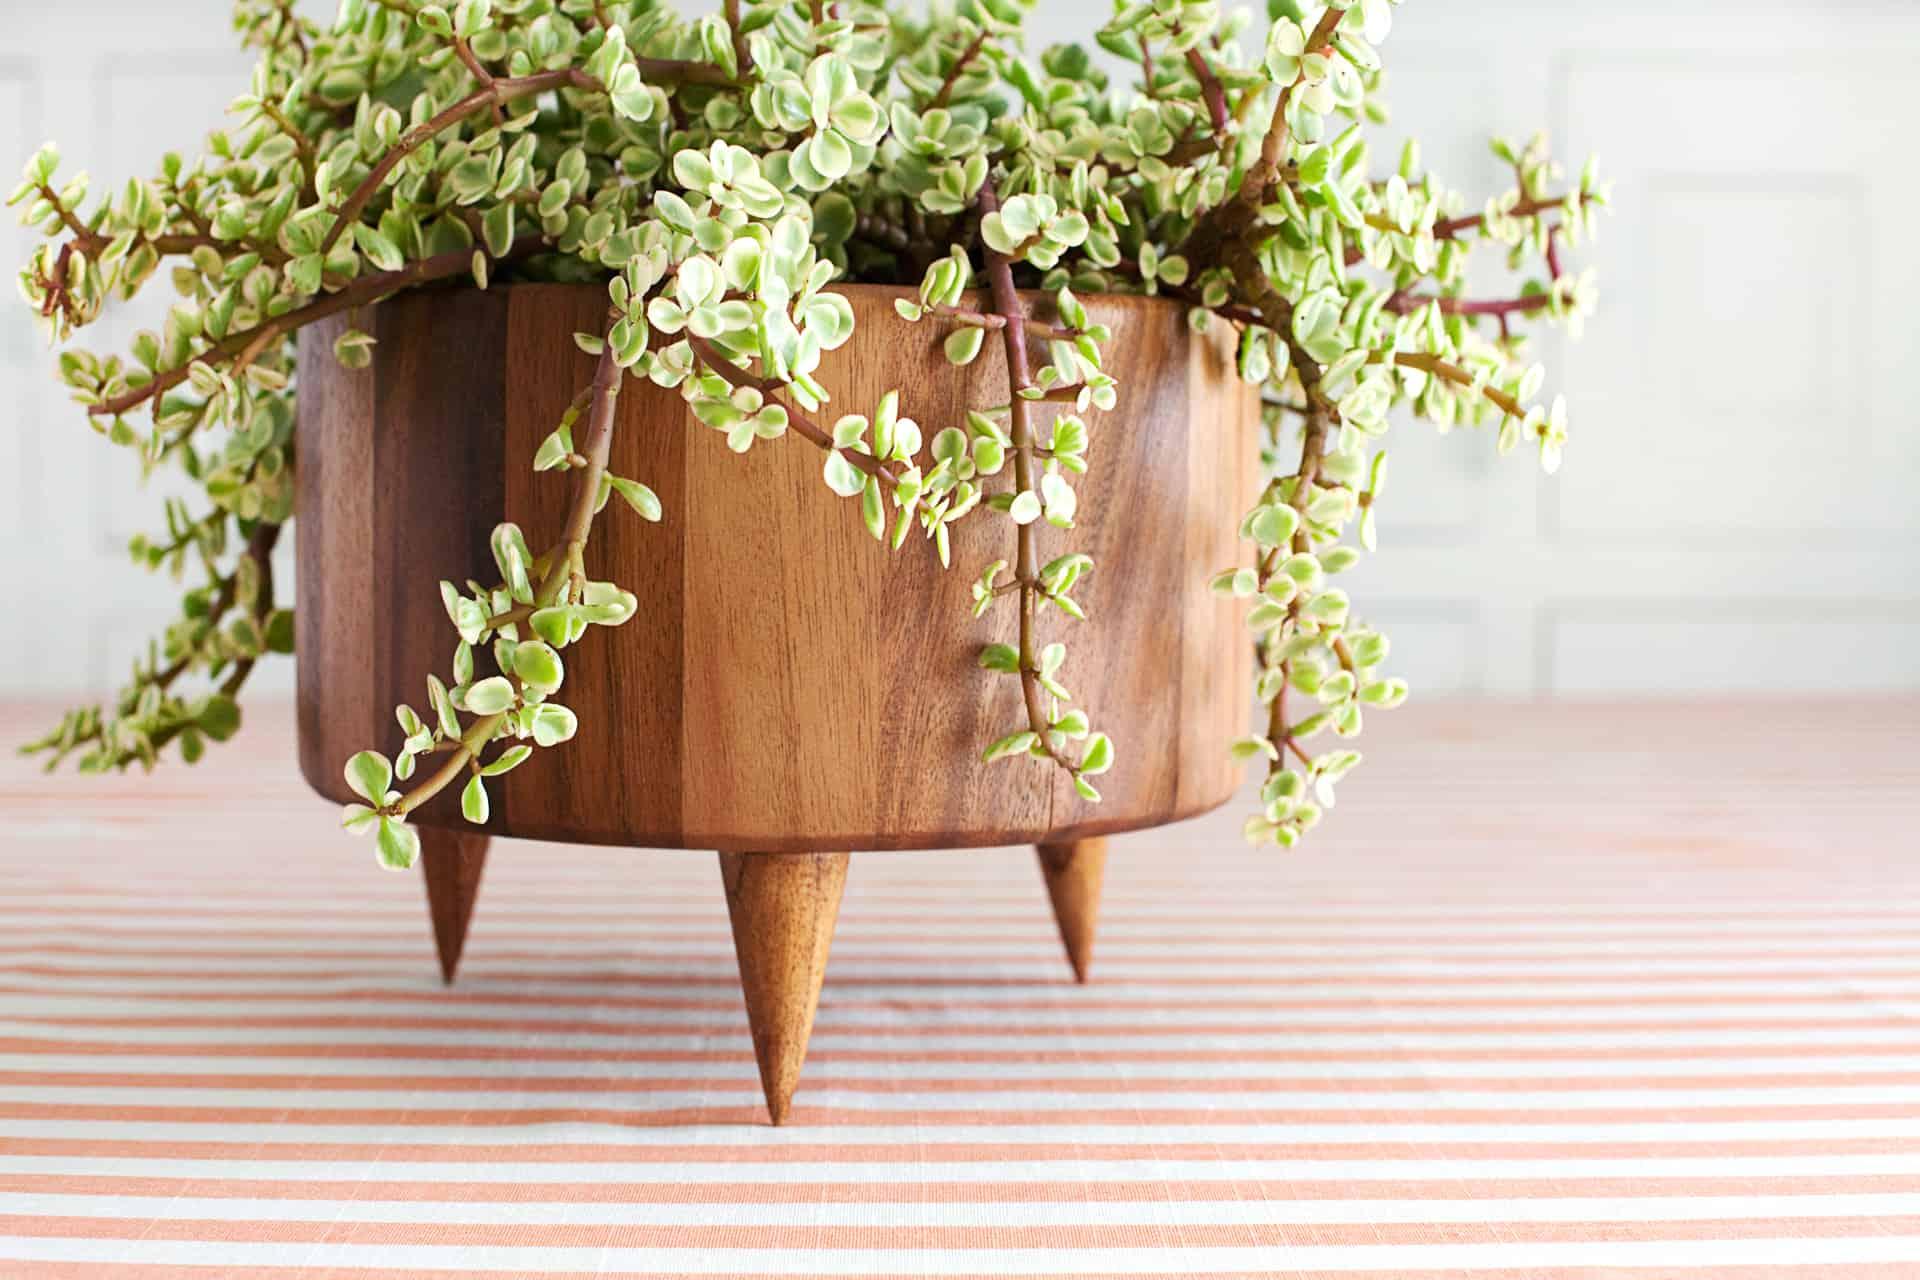 Cone wooden planter